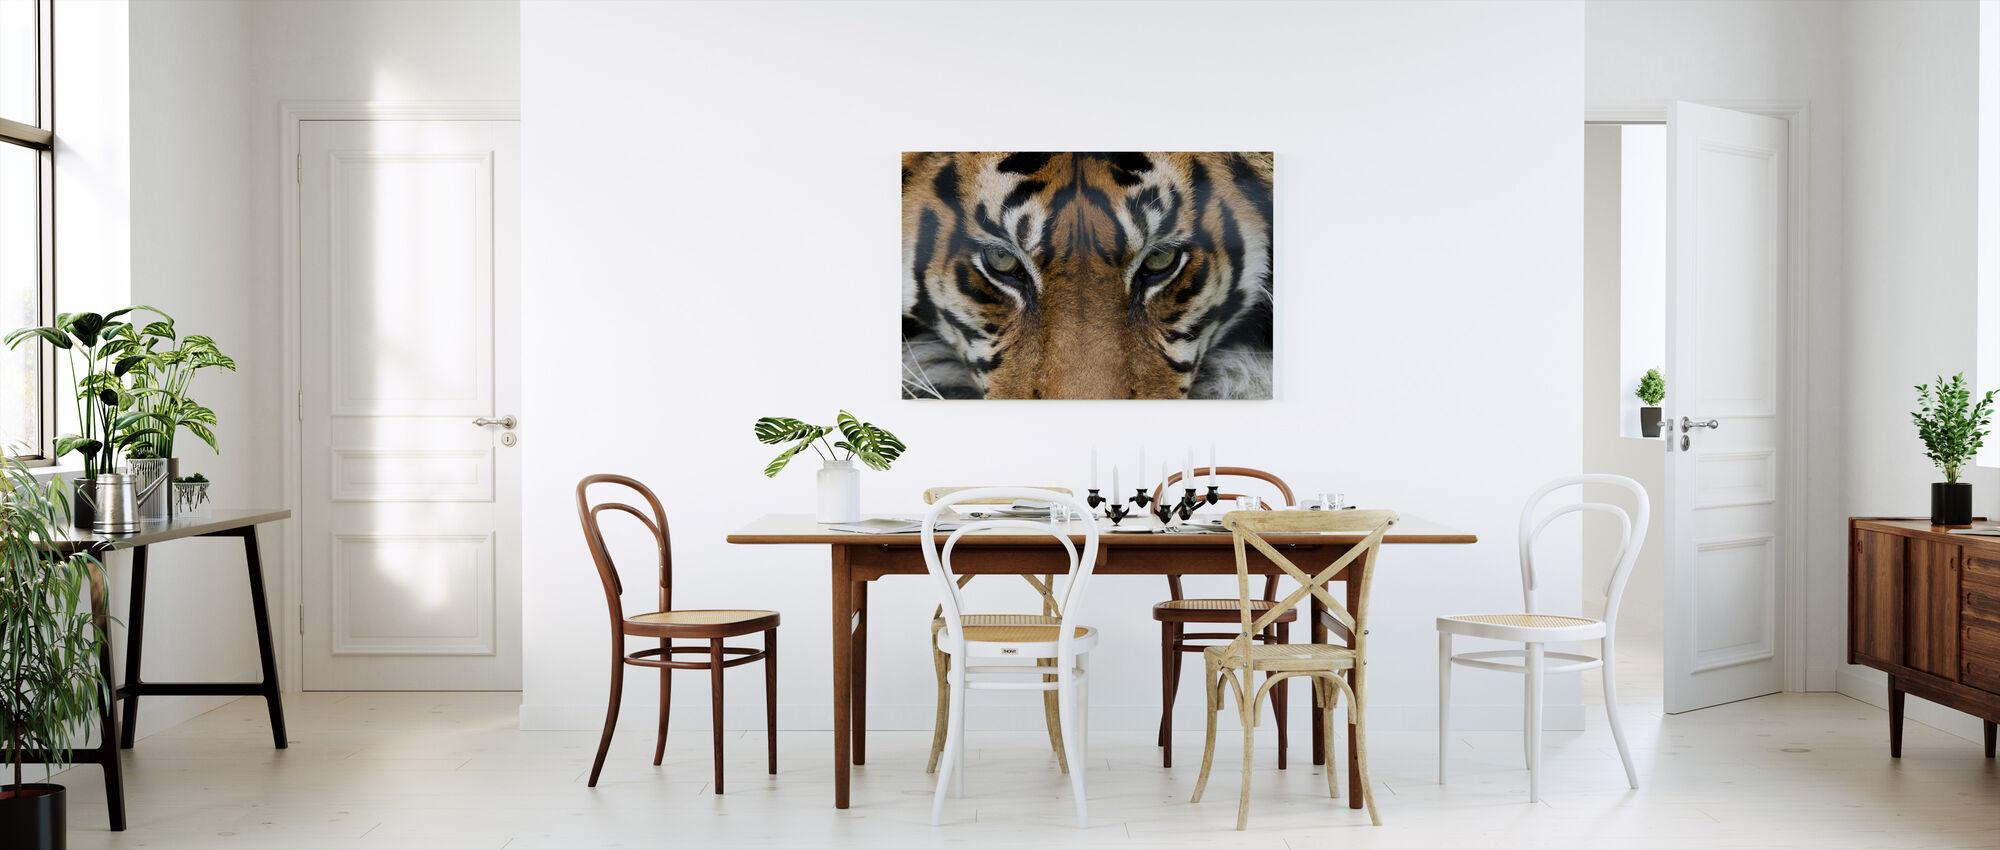 Tigerns öga - Canvastavla - Kök